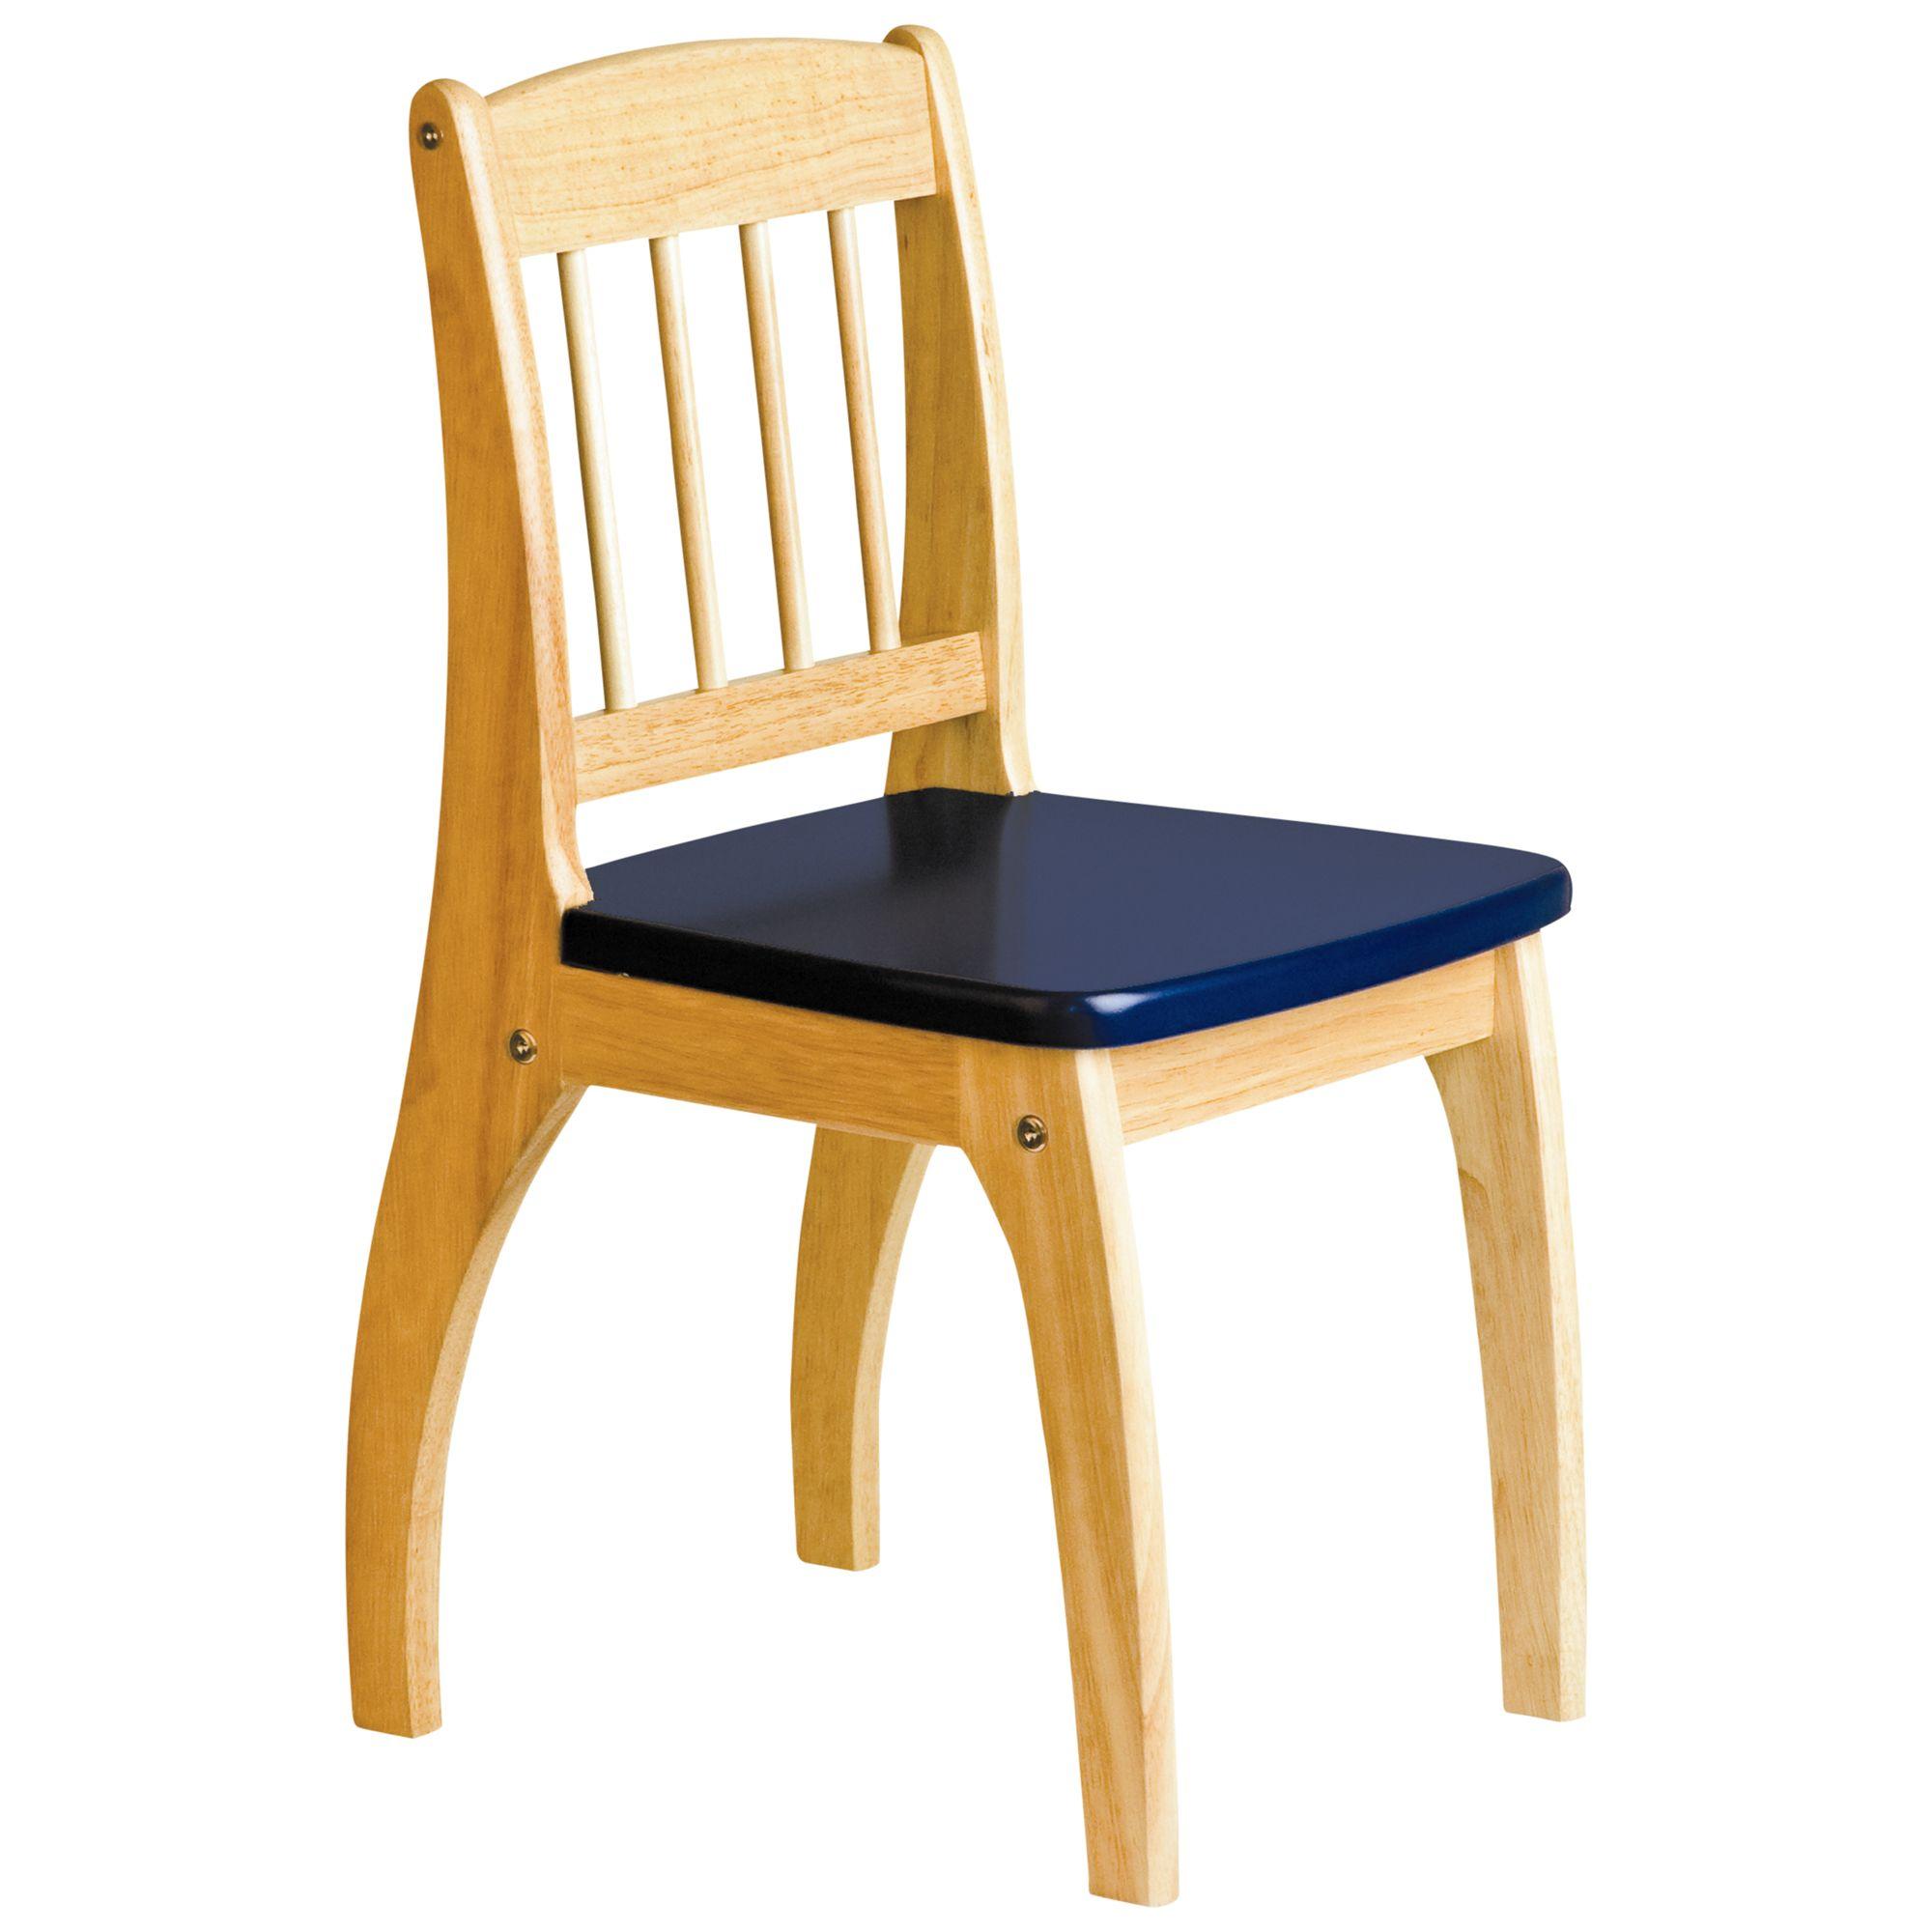 John Crane John Crane Junior Chair, Natural Wood Finish/Navy Blue